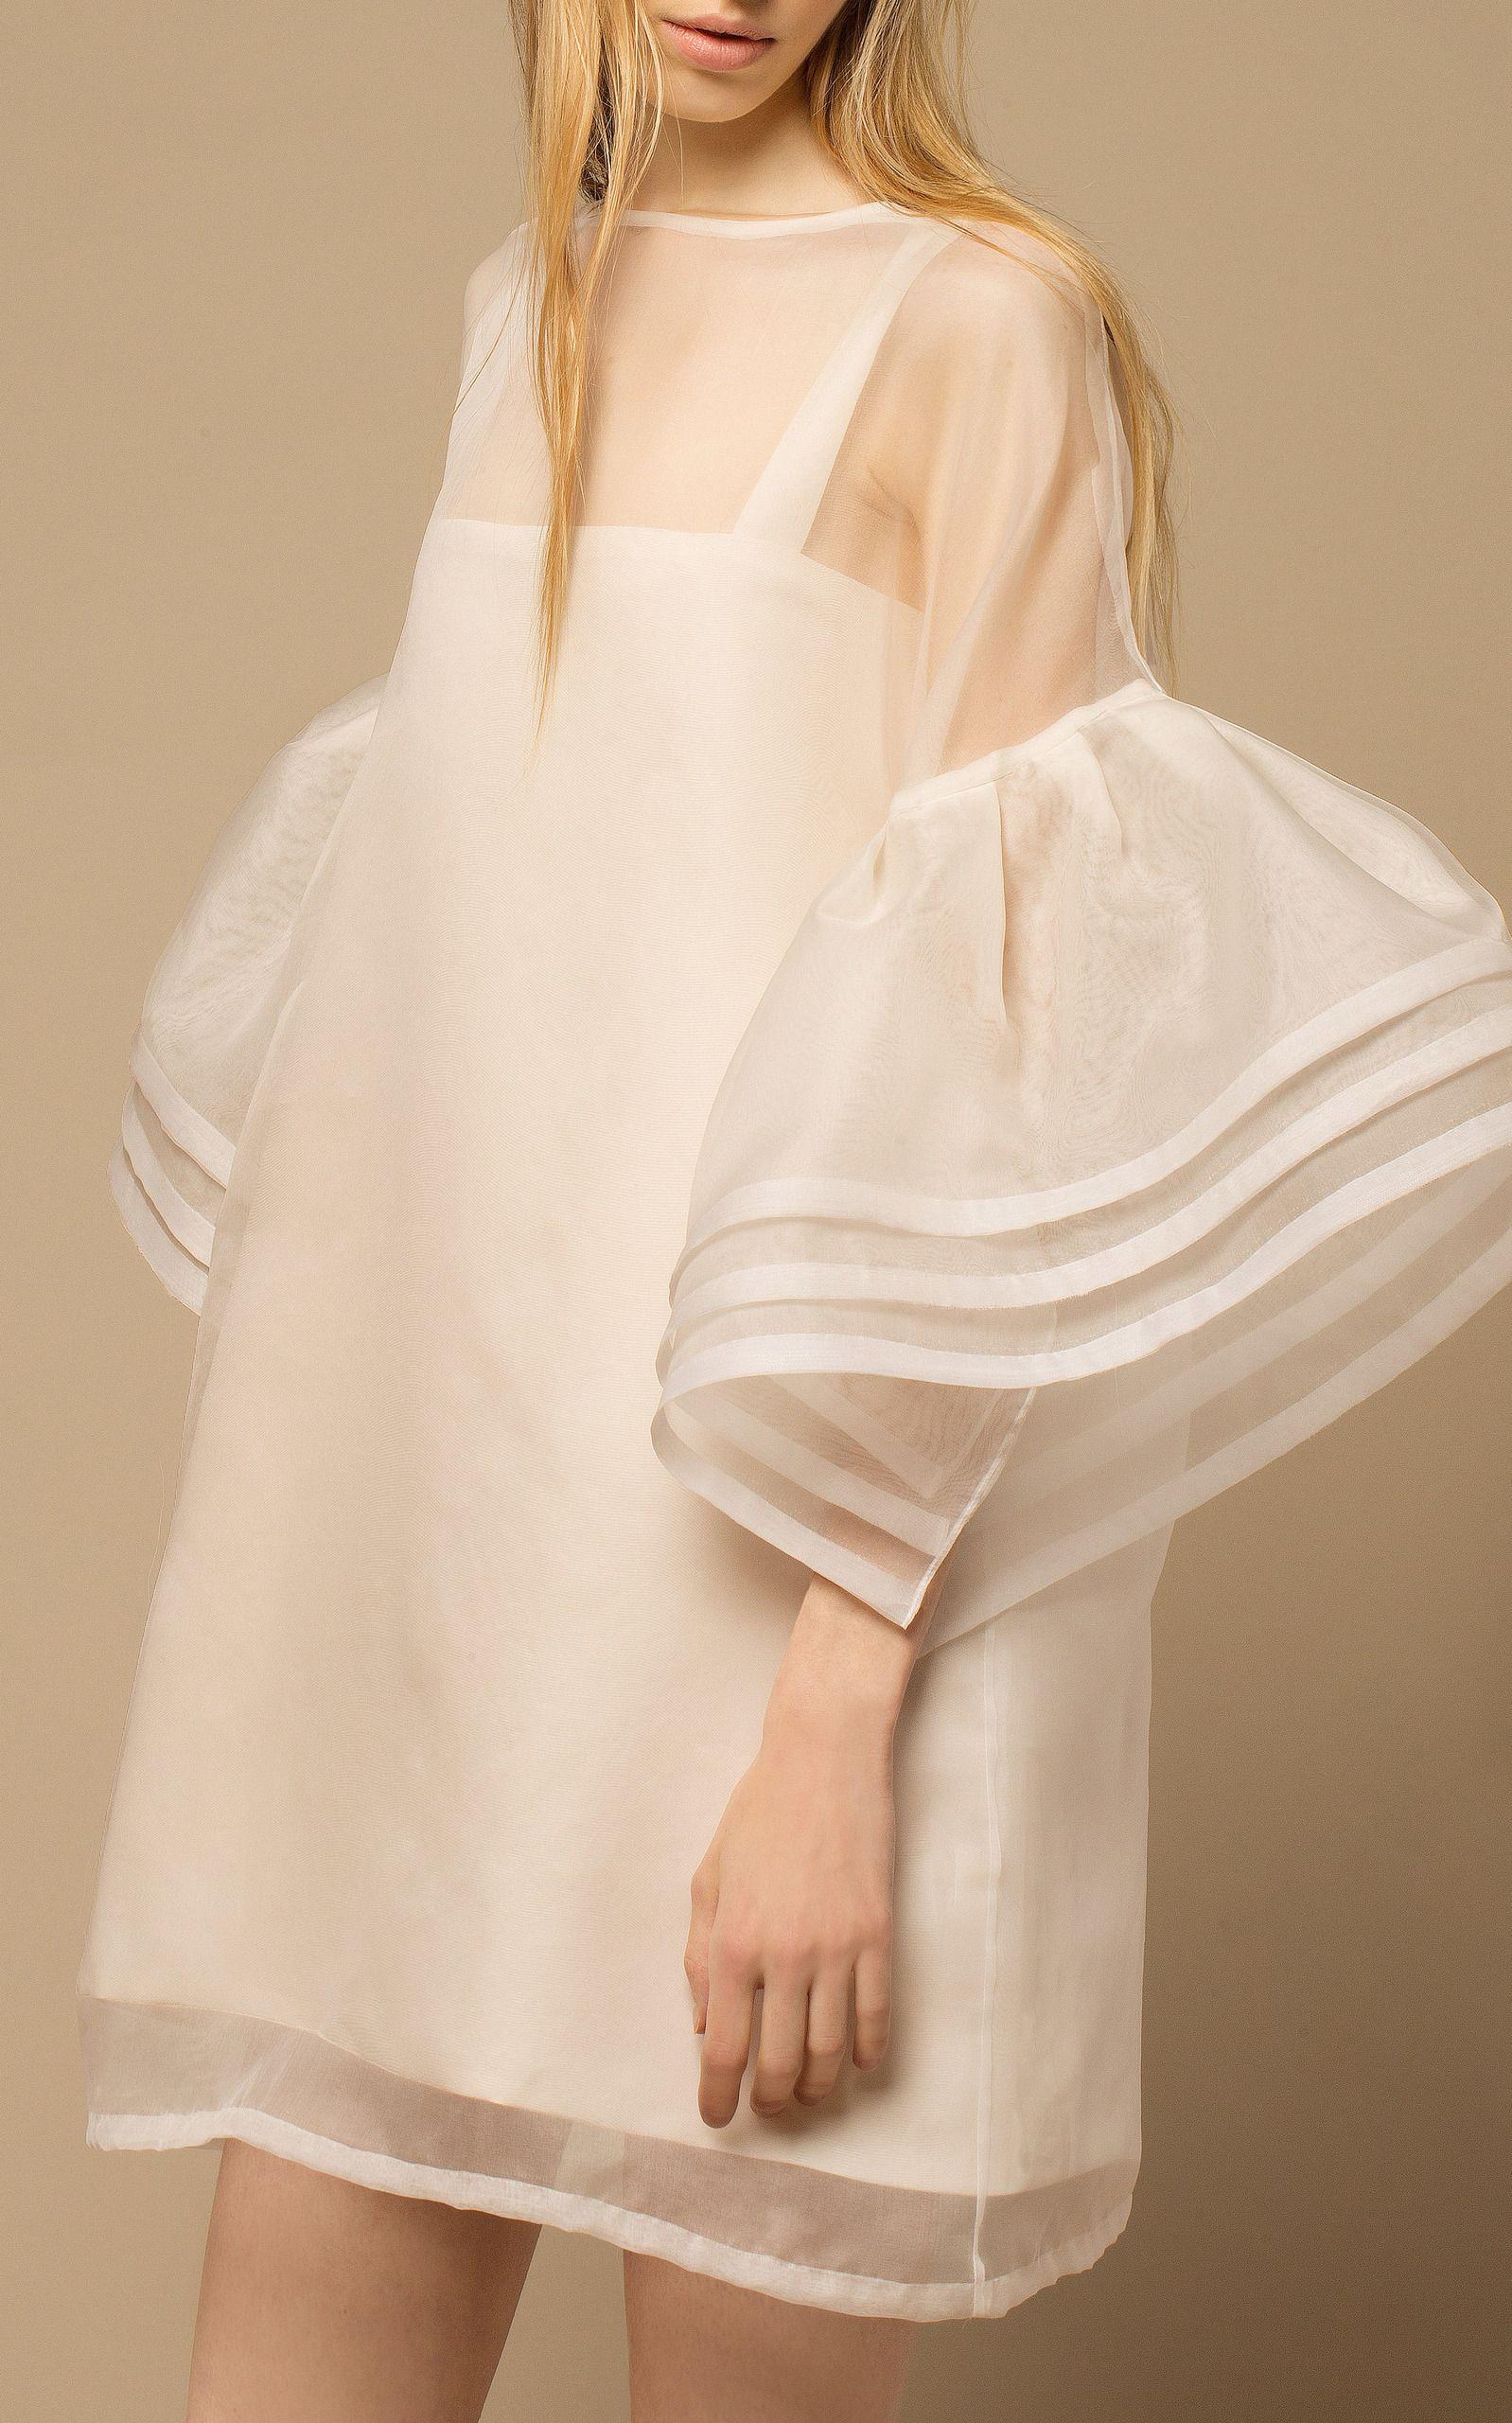 Just because itus lovely dpr pinterest fashion mini dresses